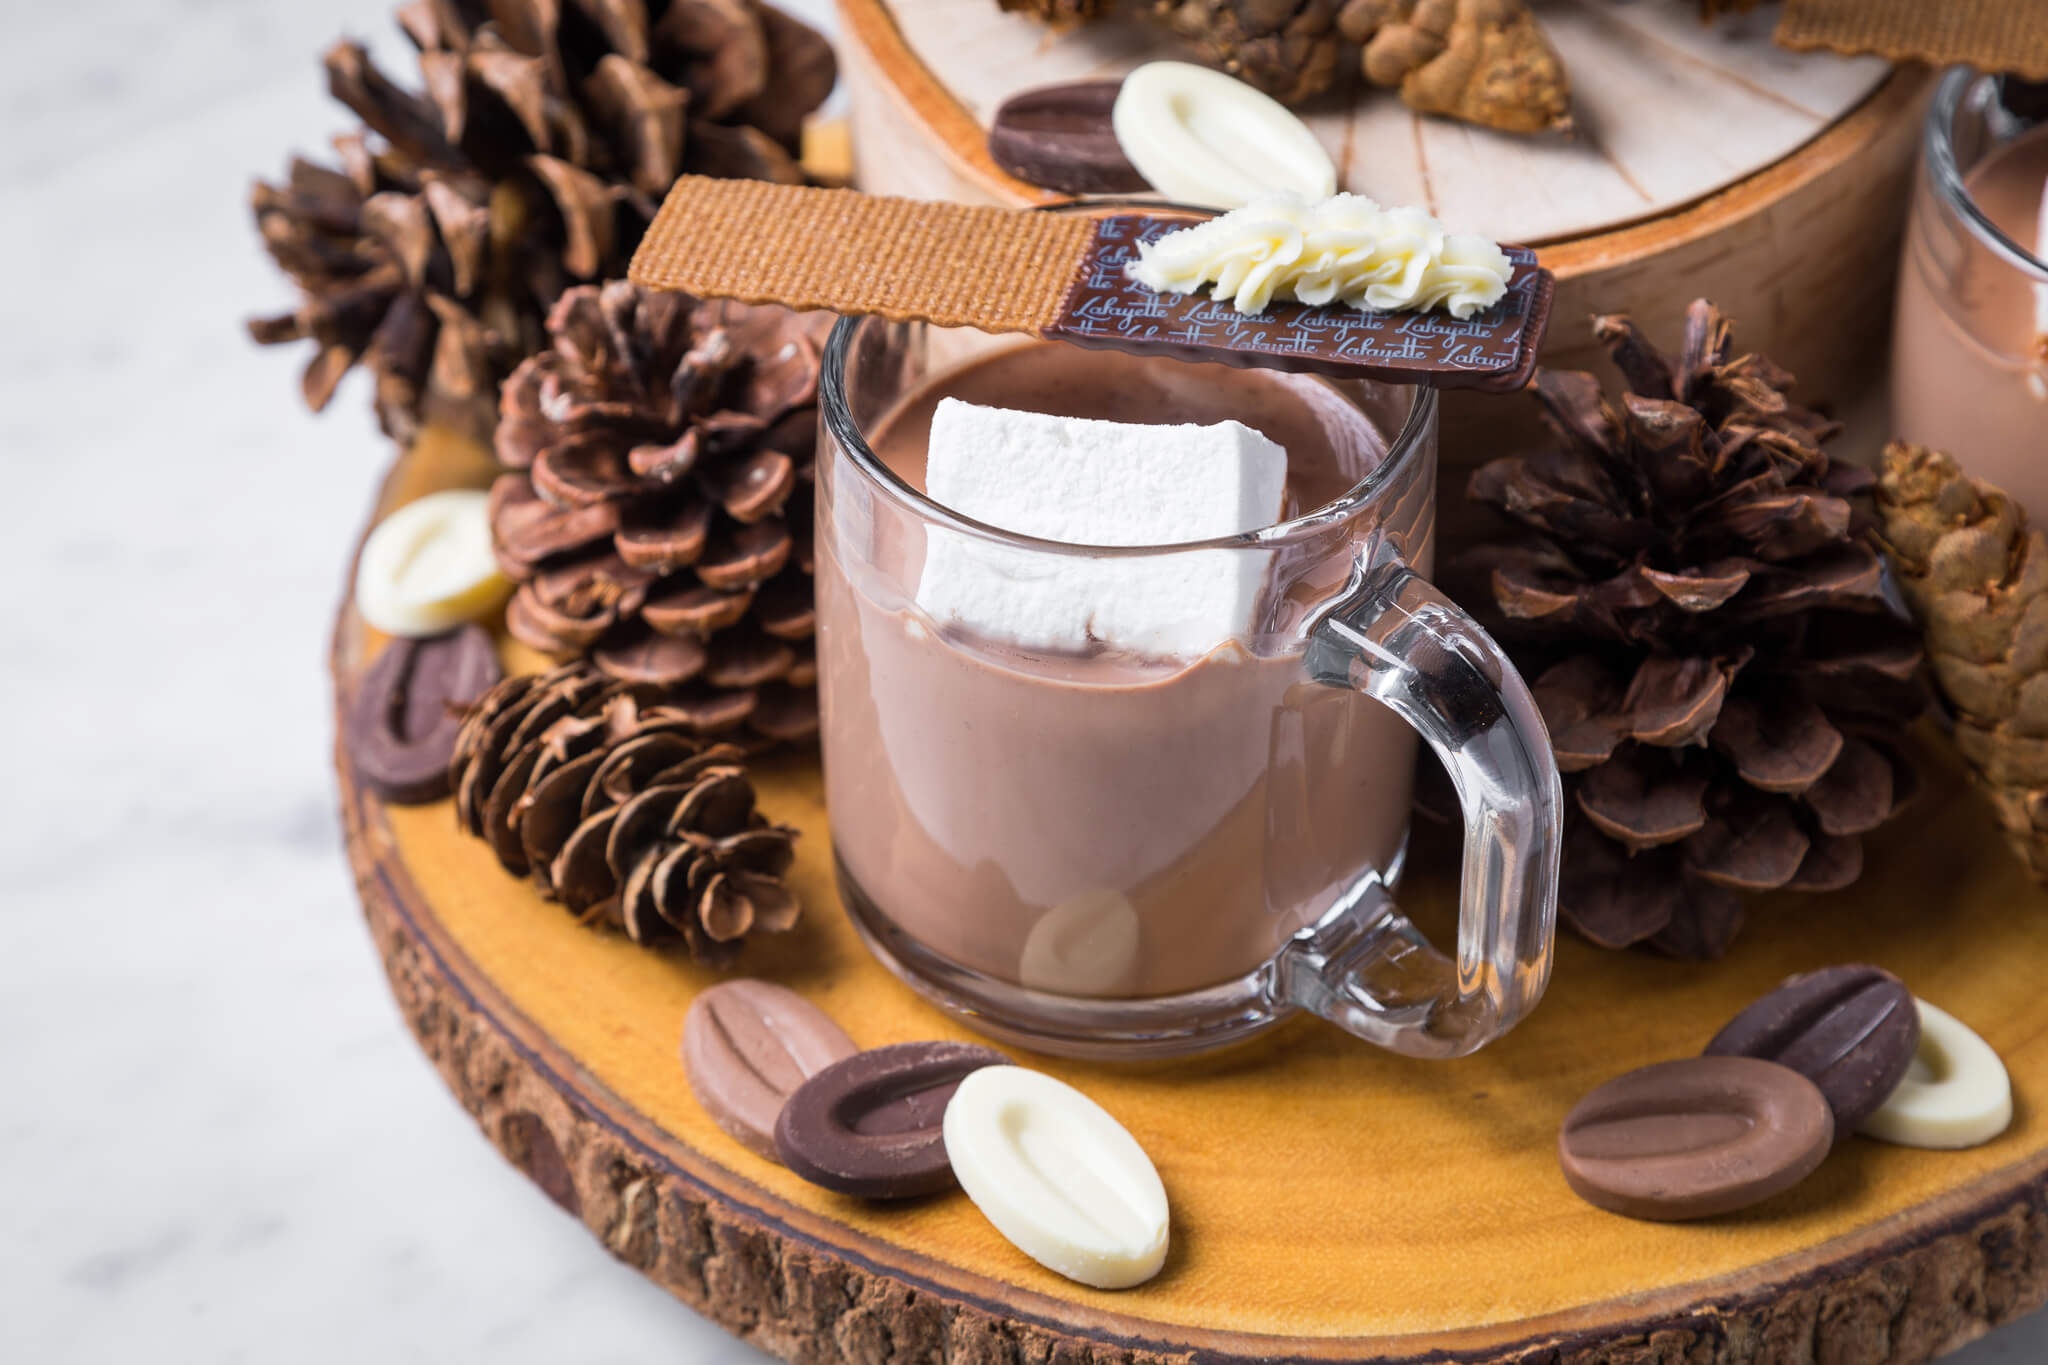 lafayette hot chocolate